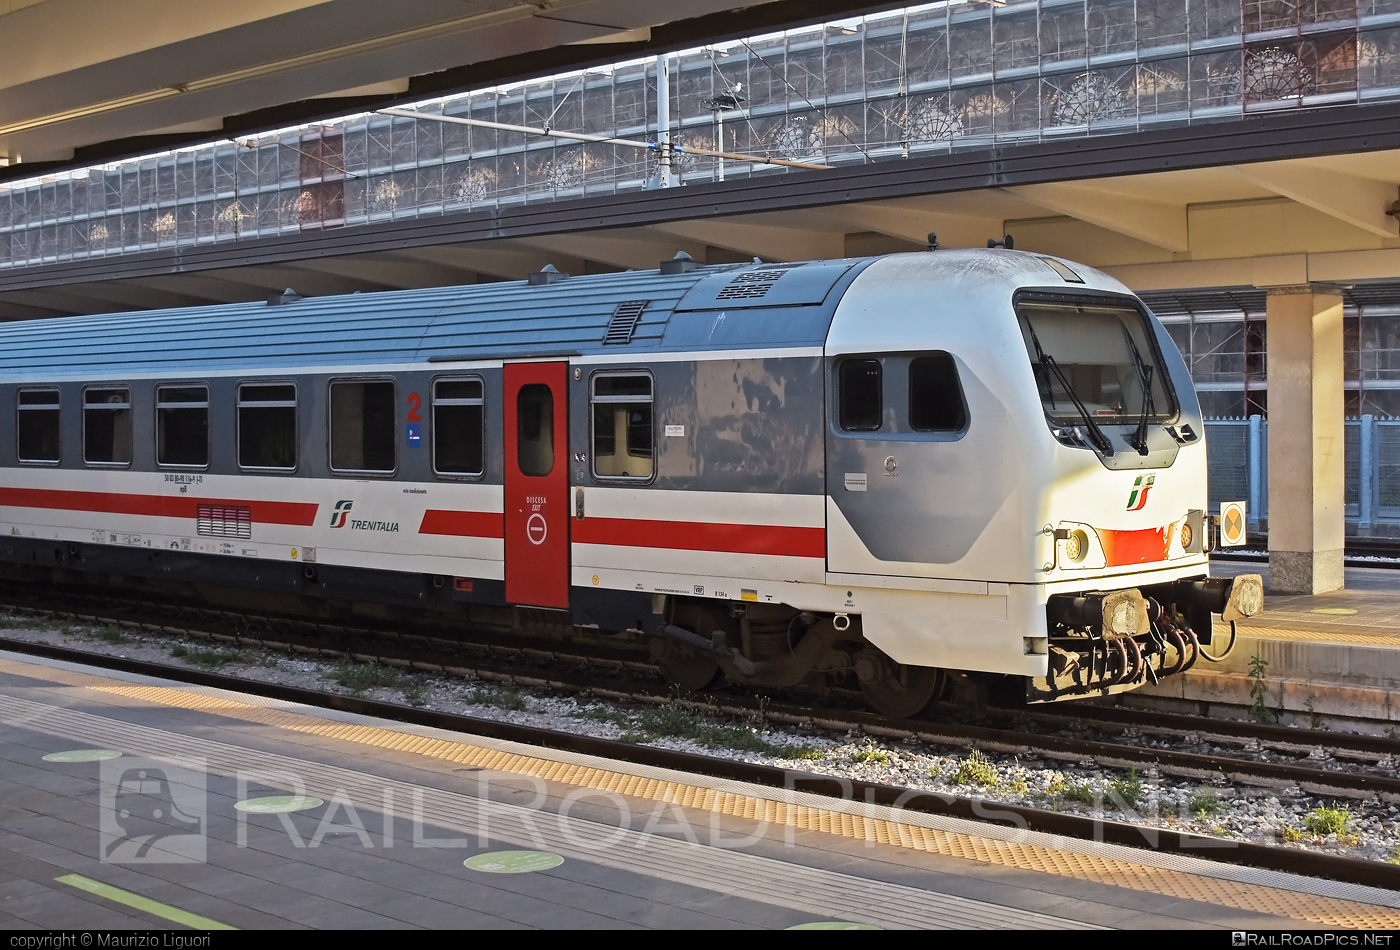 Class B - npB 80-98 UIC-Z1 semi-pilot - 80-98 116-9 operated by Trenitalia S.p.A. #ferroviedellostato #fs #fsitaliane #npb #trenitalia #trenitaliaspa